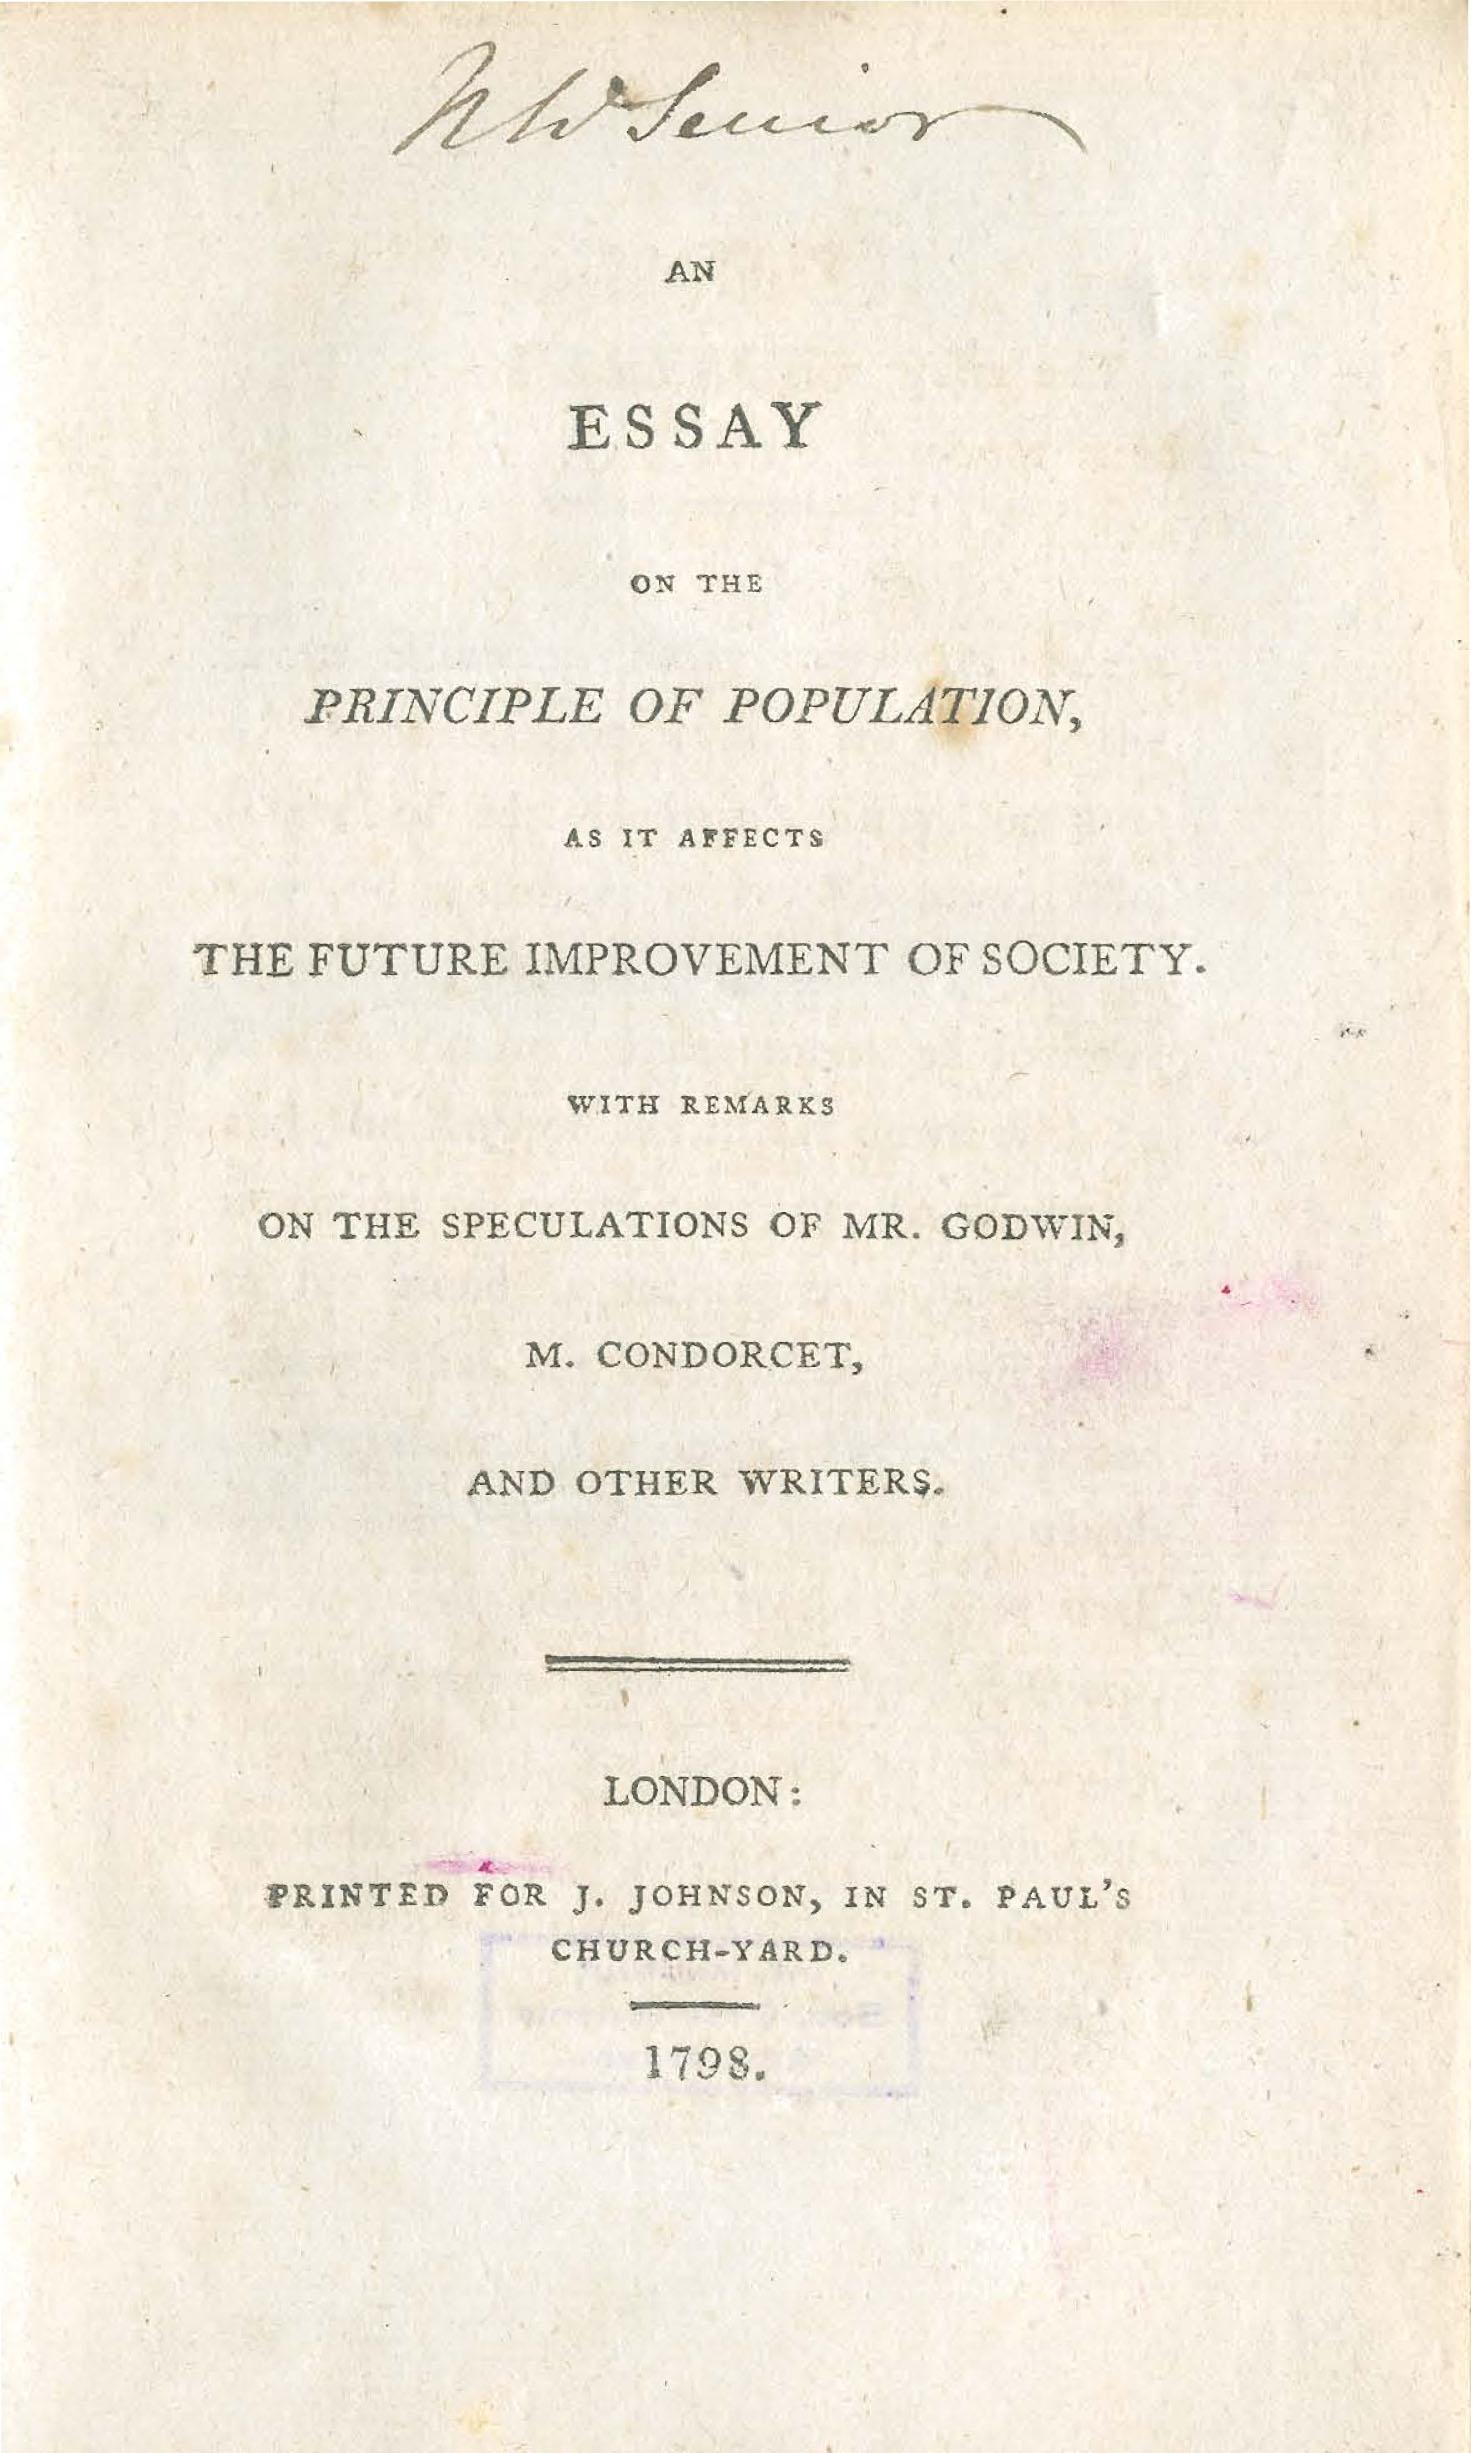 001 Thomas Malthus Essay On The Principle Of Population Stupendous After Reading Malthus's Principles Darwin Got Idea That Ap Euro Full